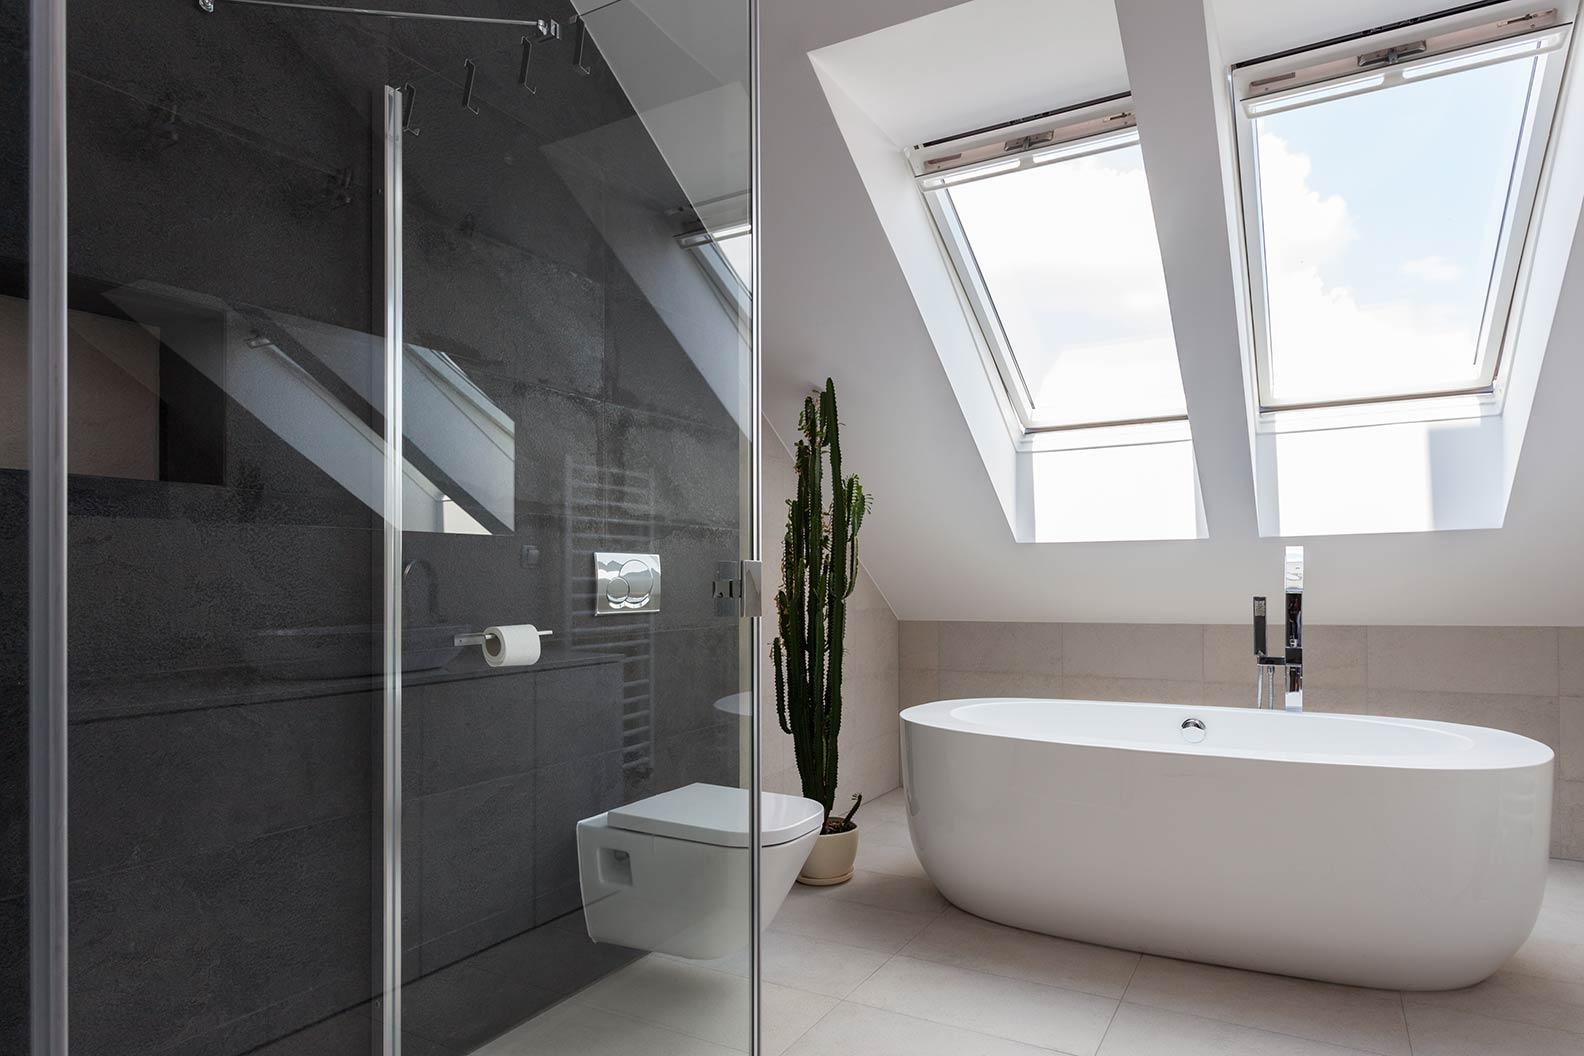 bathtub refinishing Arlington Heights IL